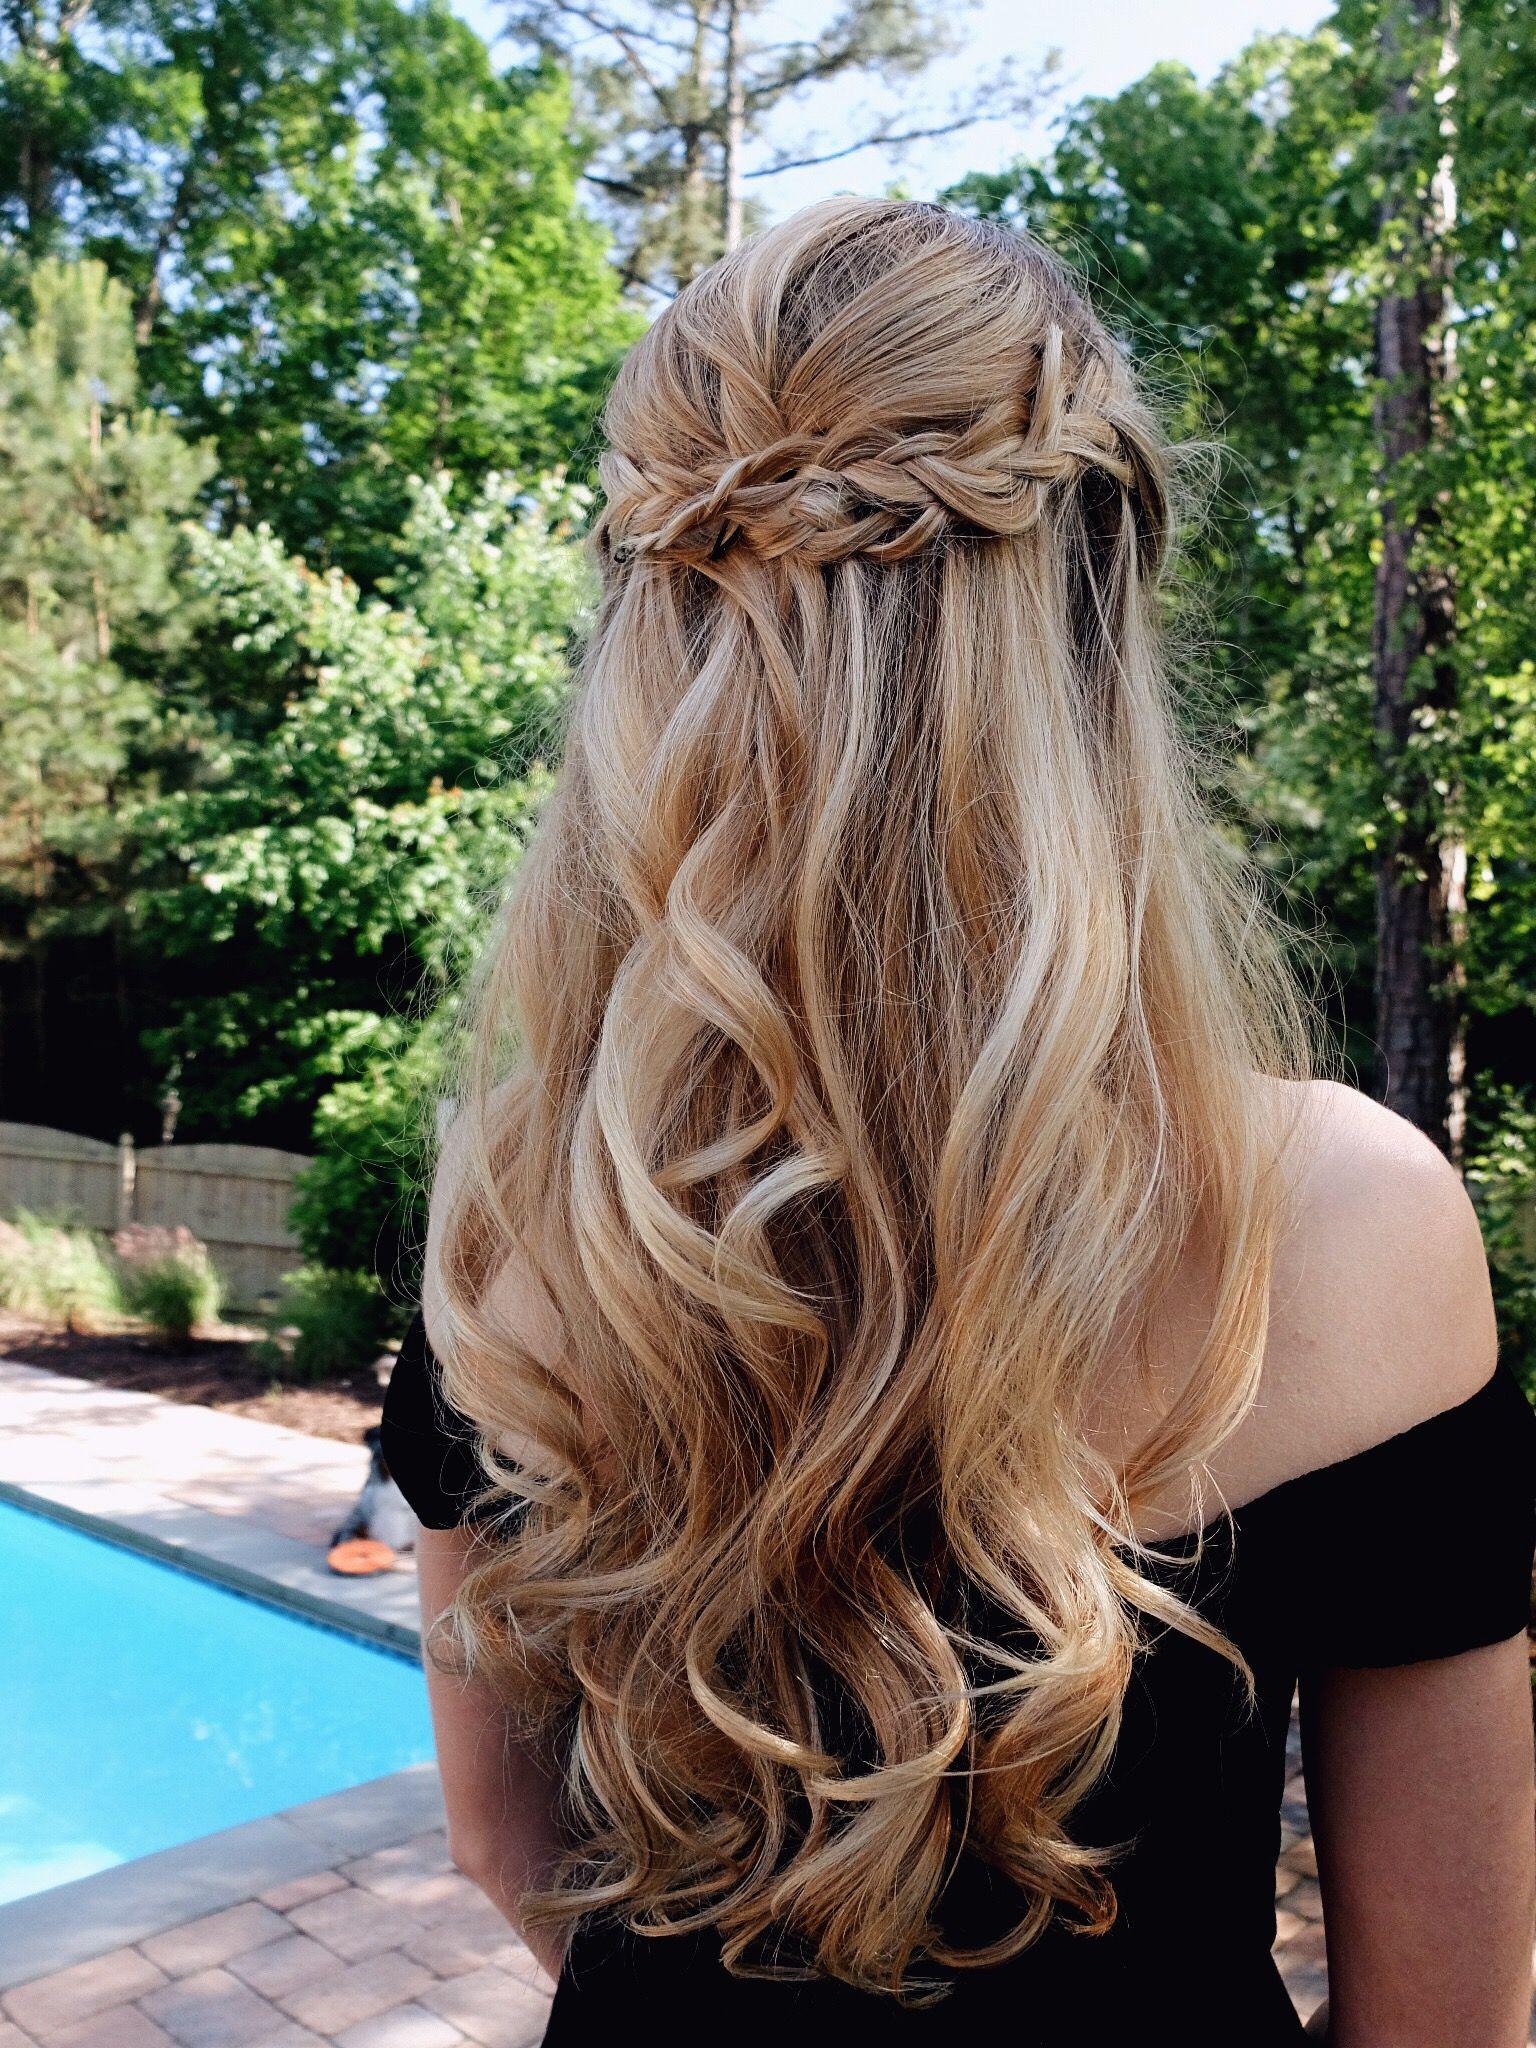 beautiful prom hair #prom #promhair #braid #curls | prom